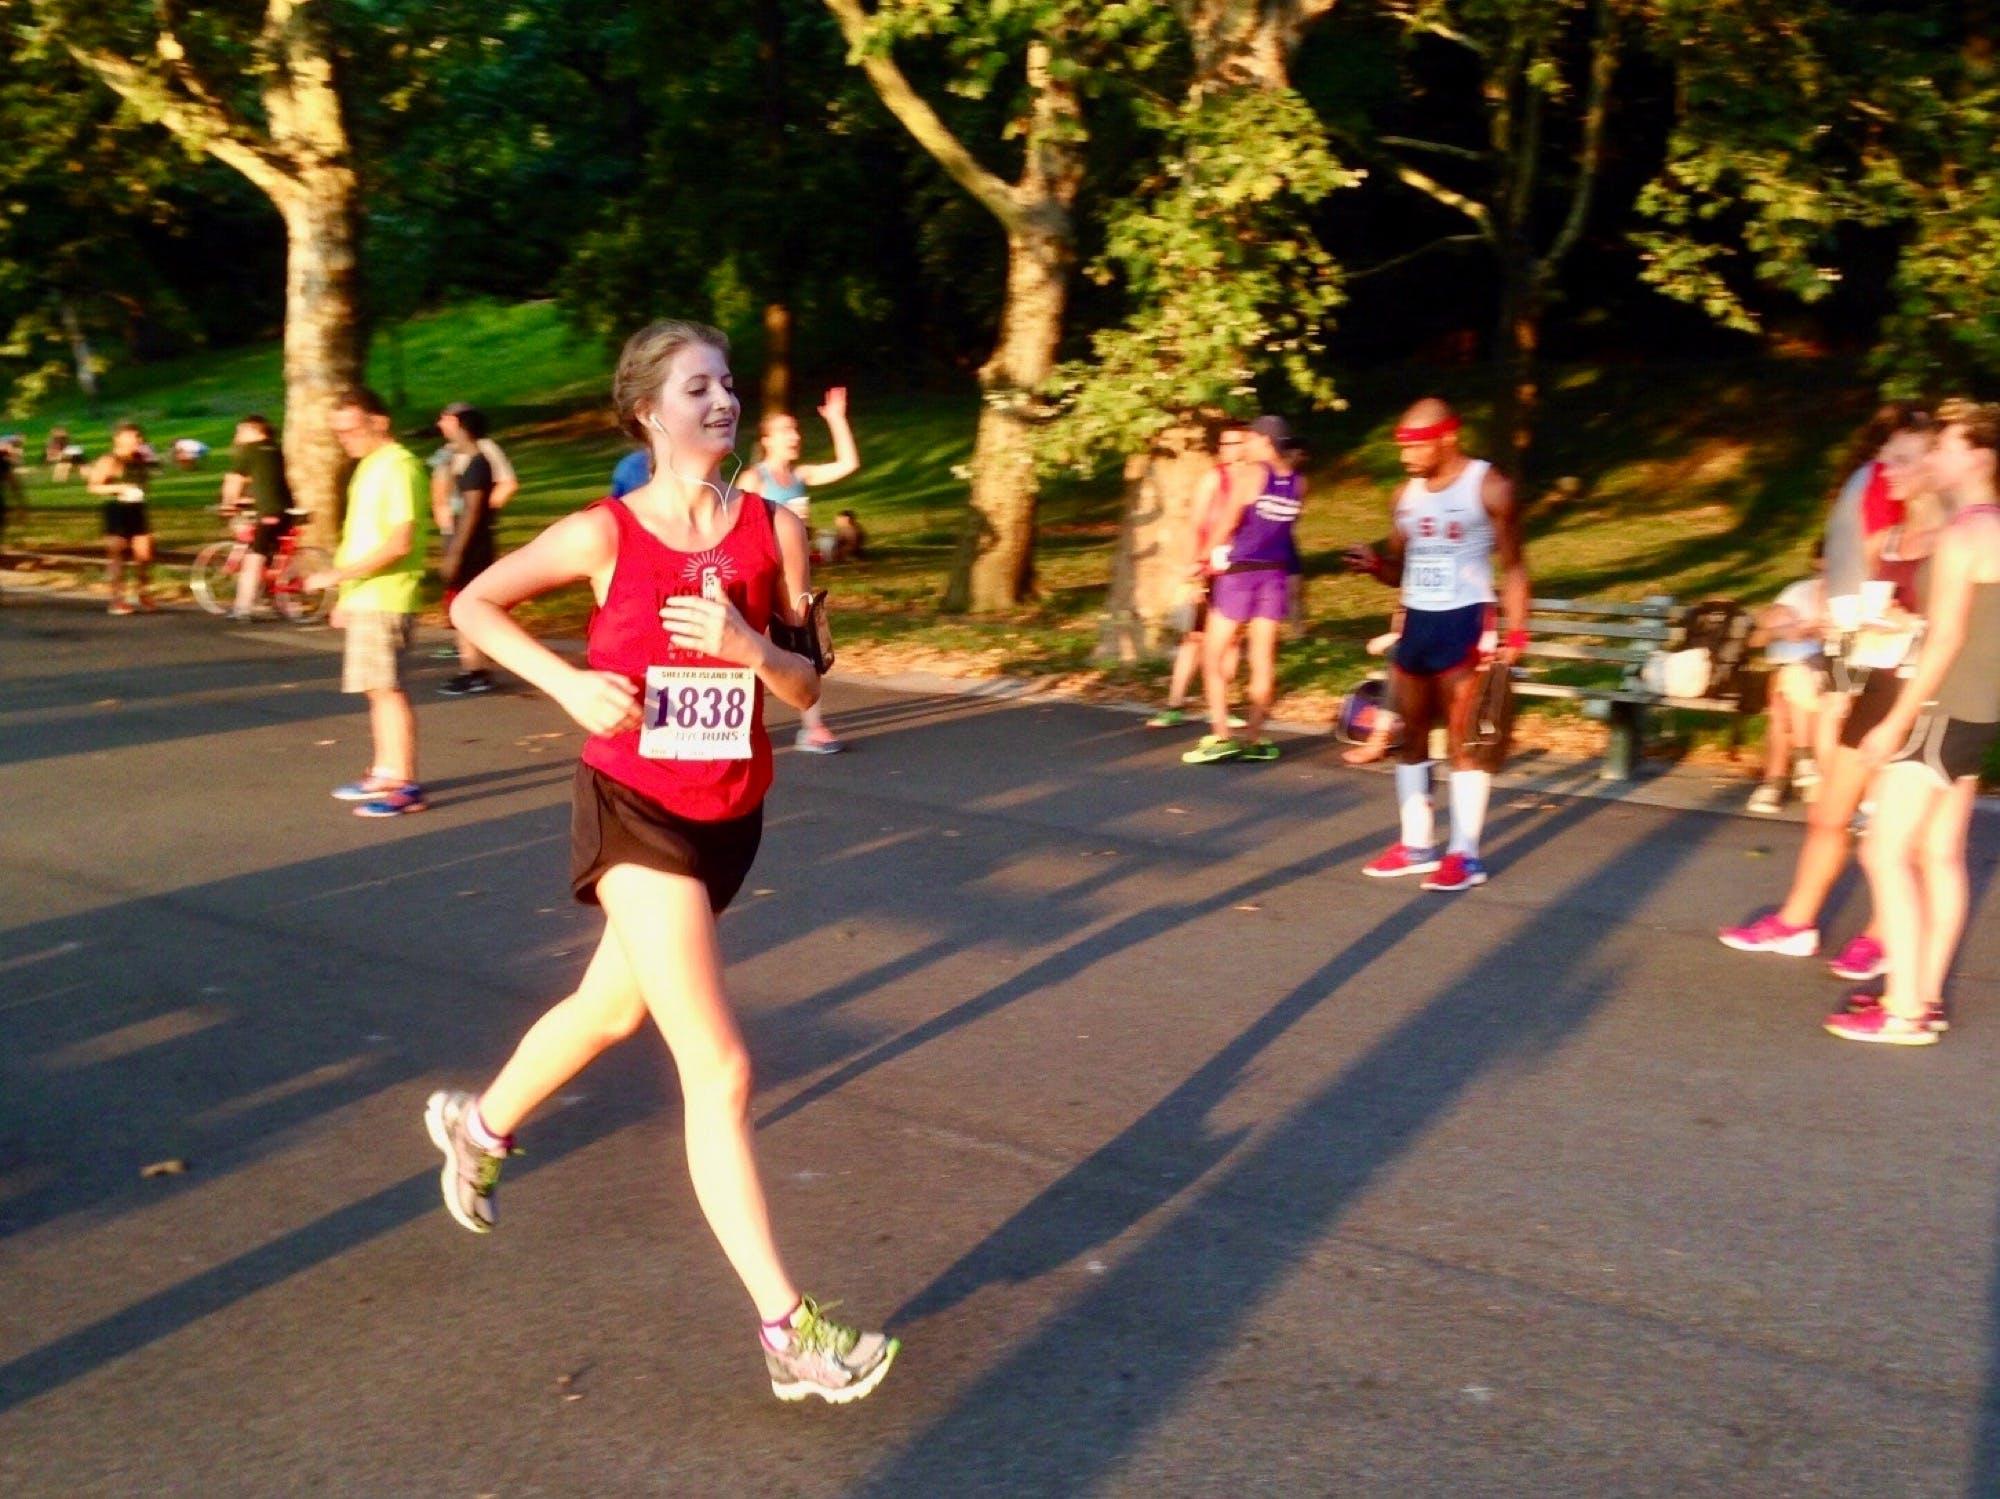 Amanda Kievet's first 5k